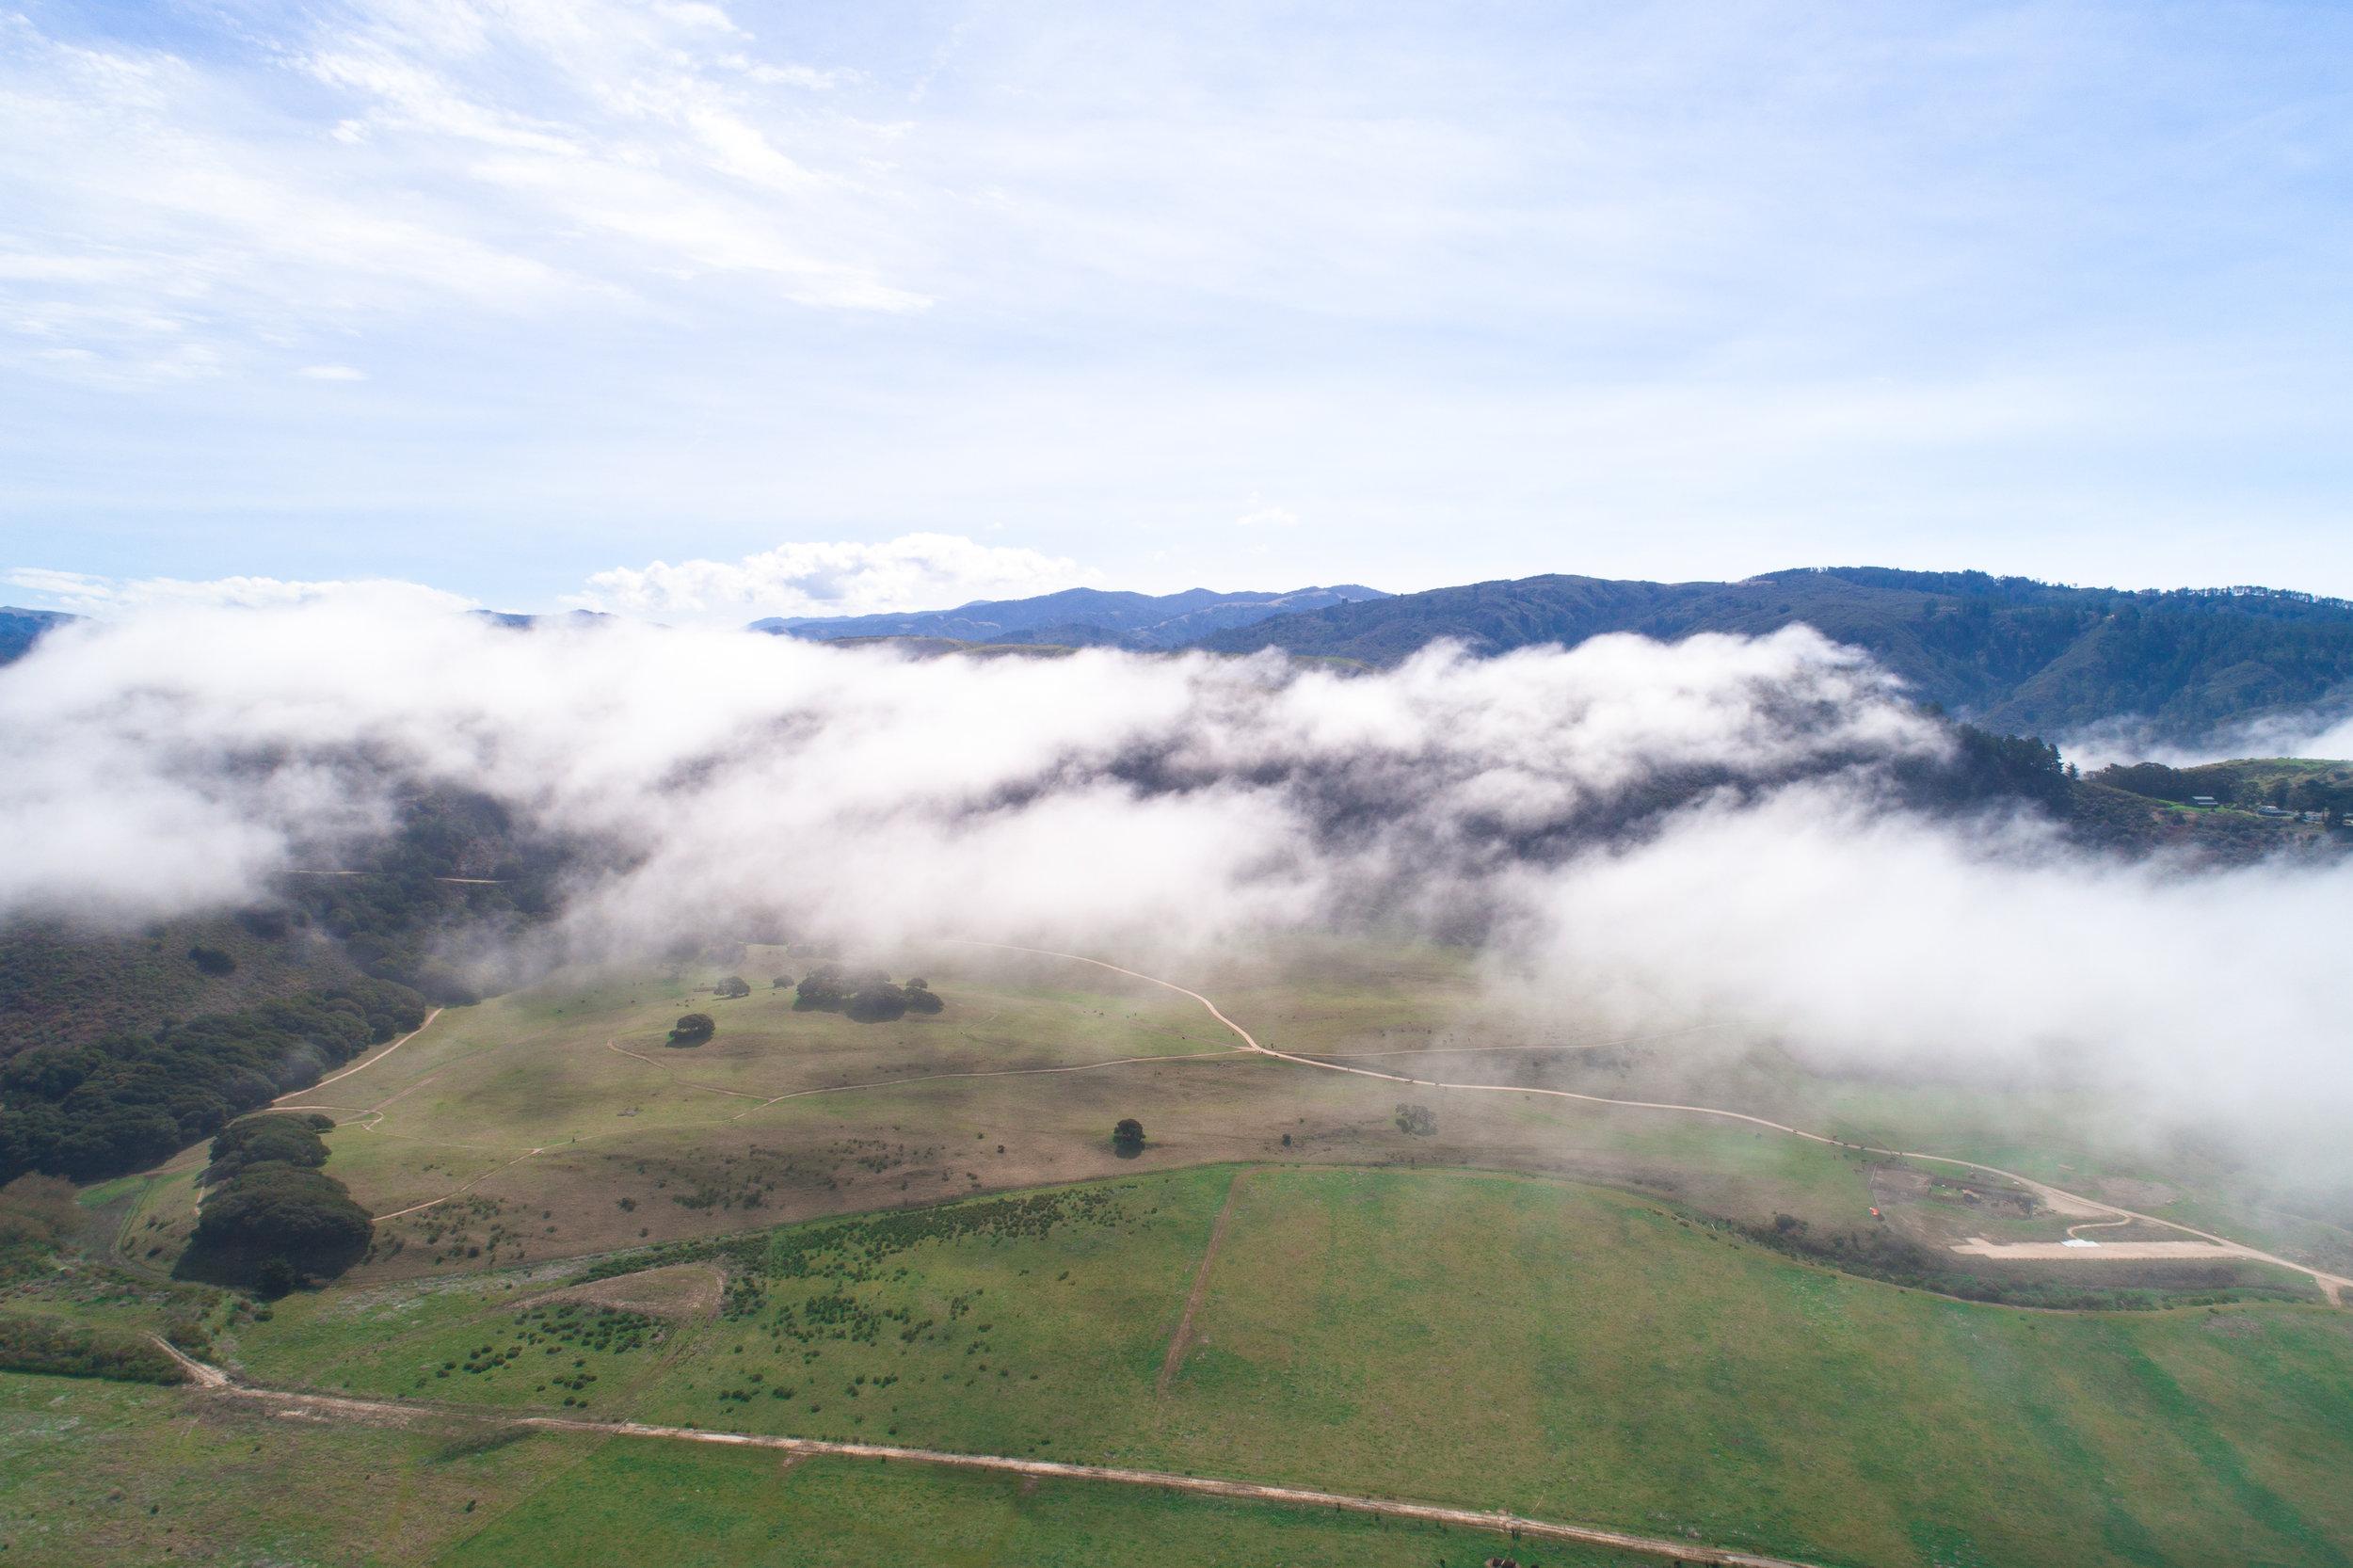 ABE1_Drone_Monterey_Carmel-2.jpg